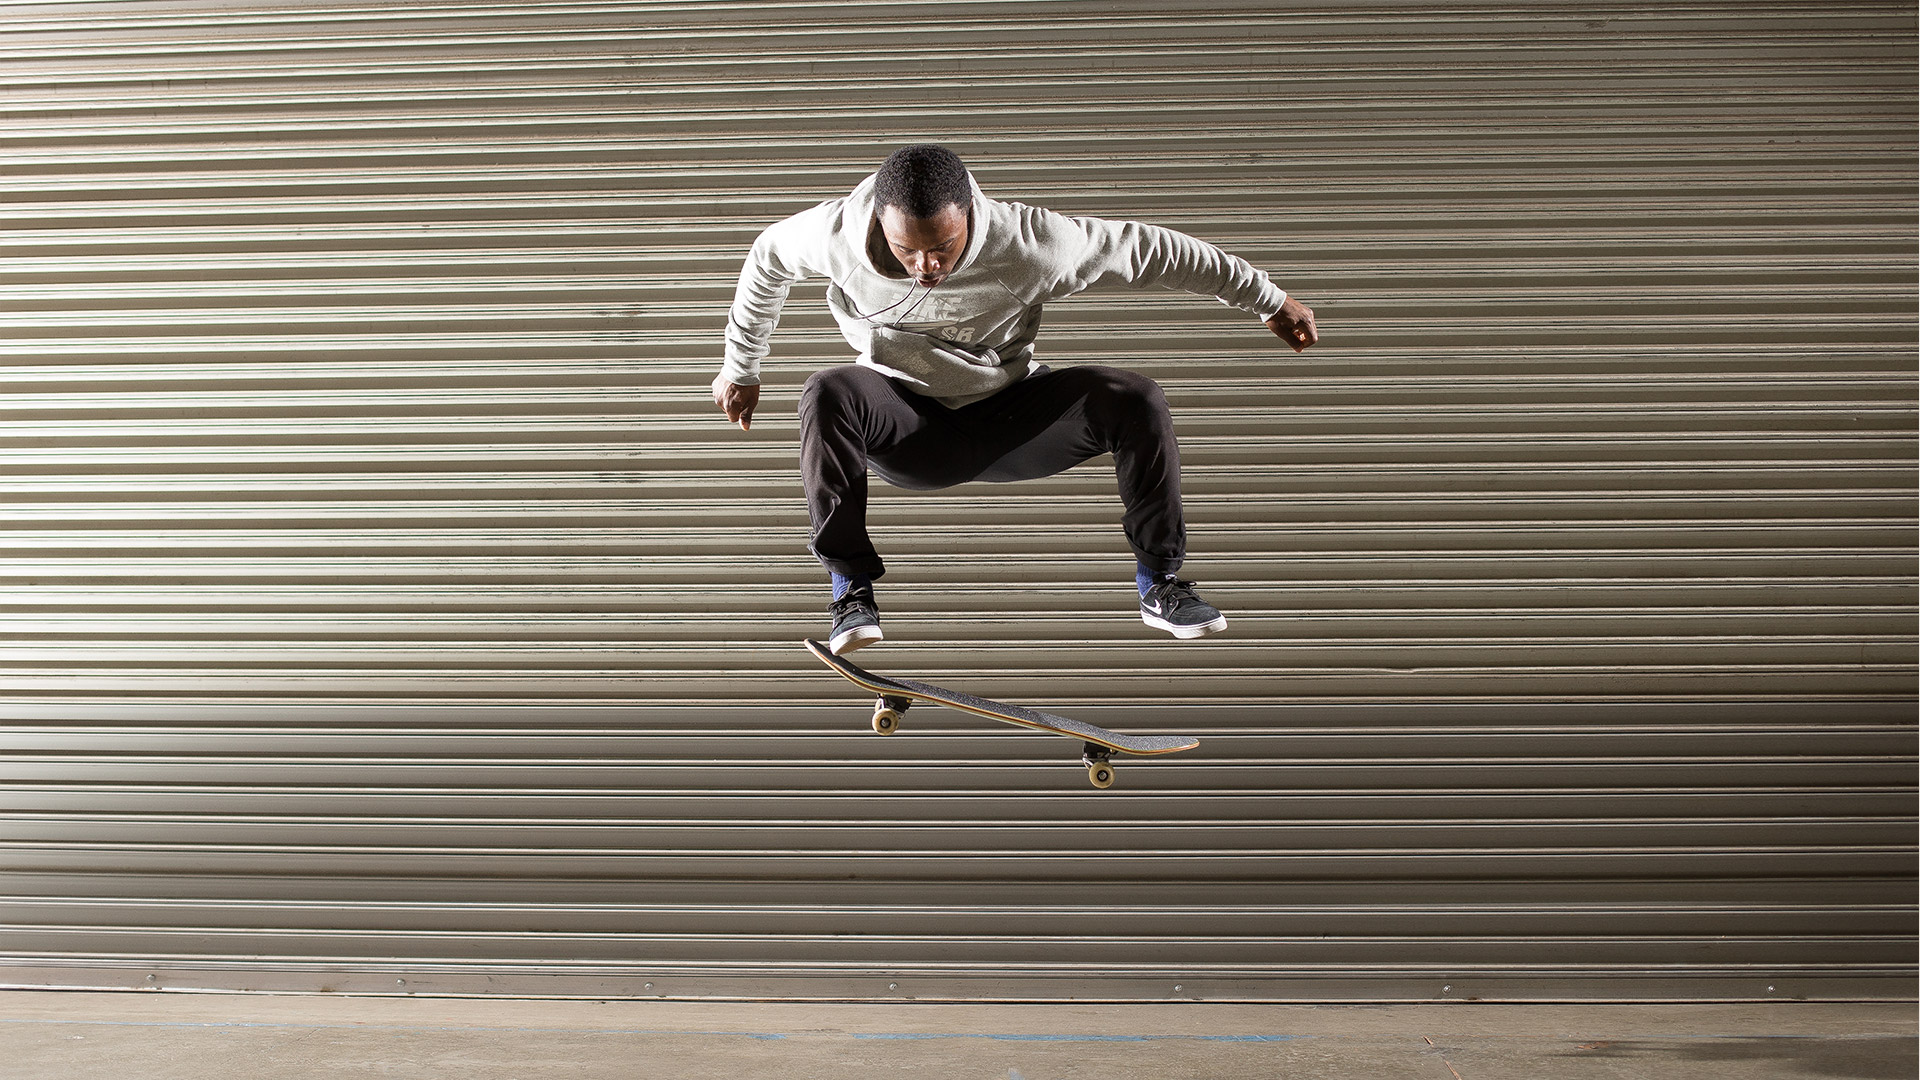 Dashawn Jordan Wasn't Really Into Skateboarding